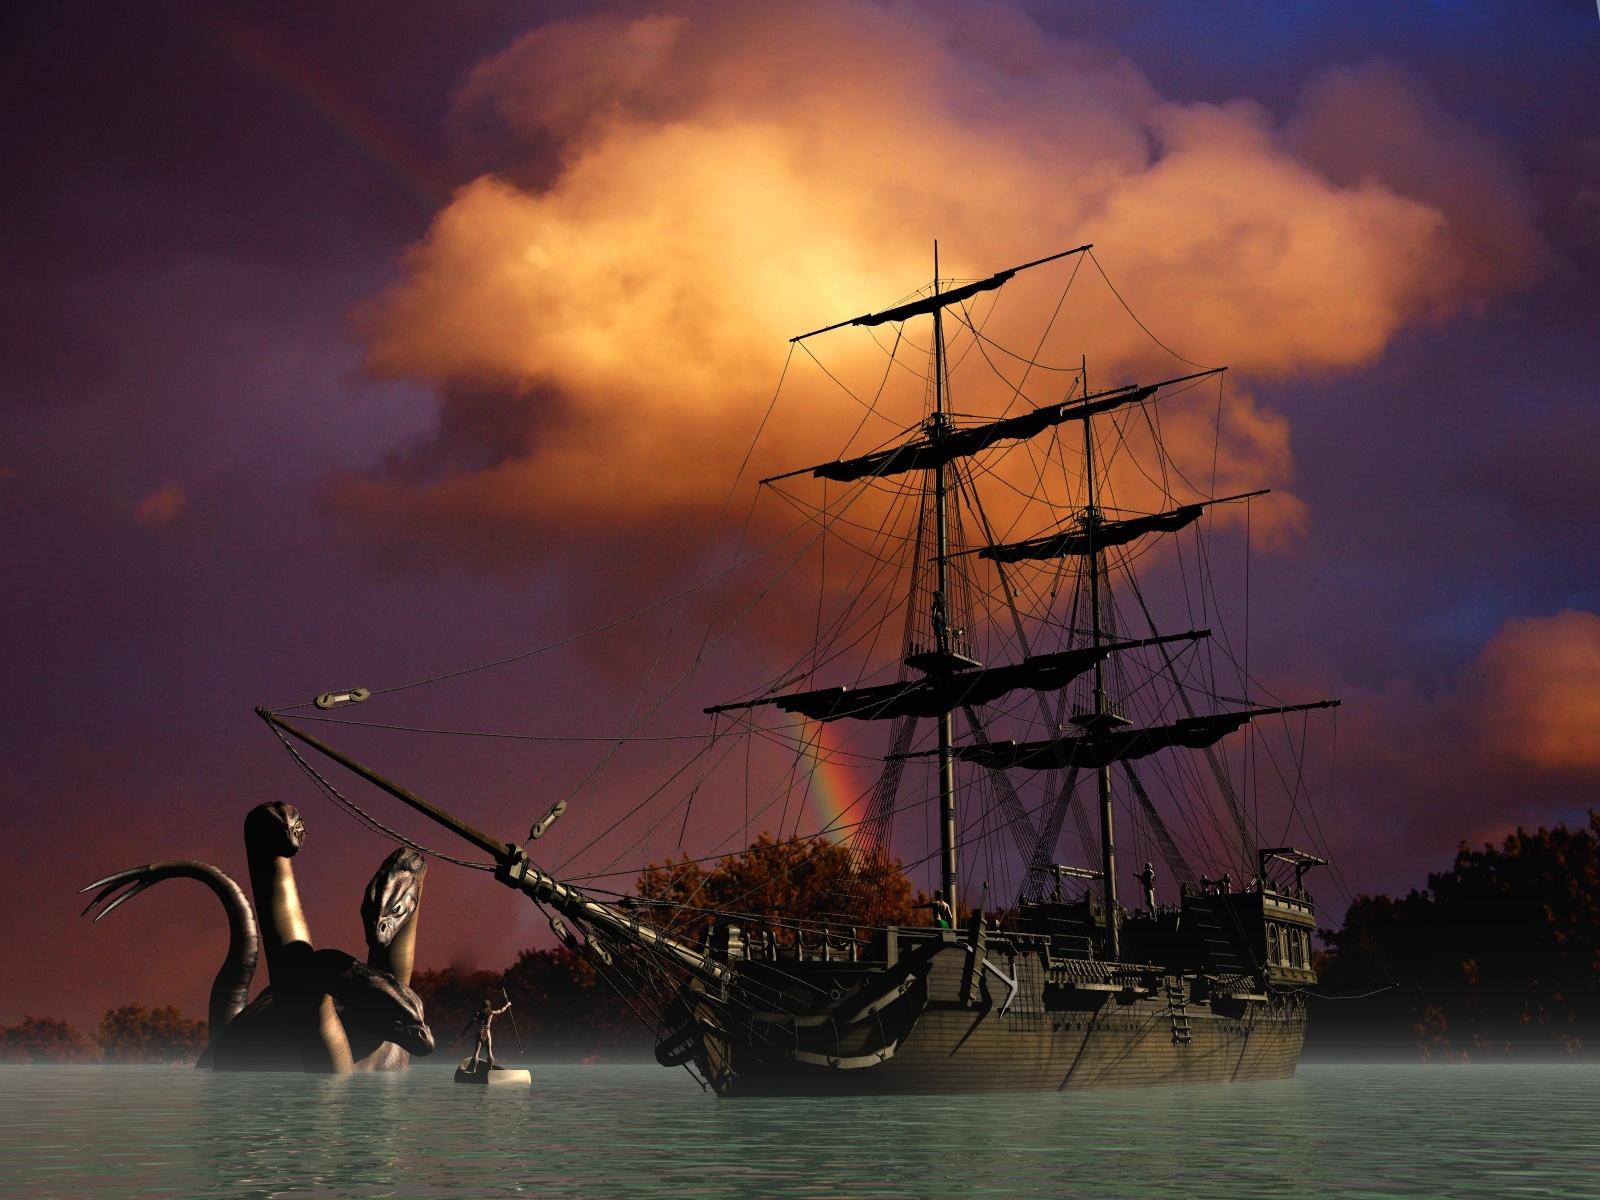 Пиратский корабль в бухте привидений